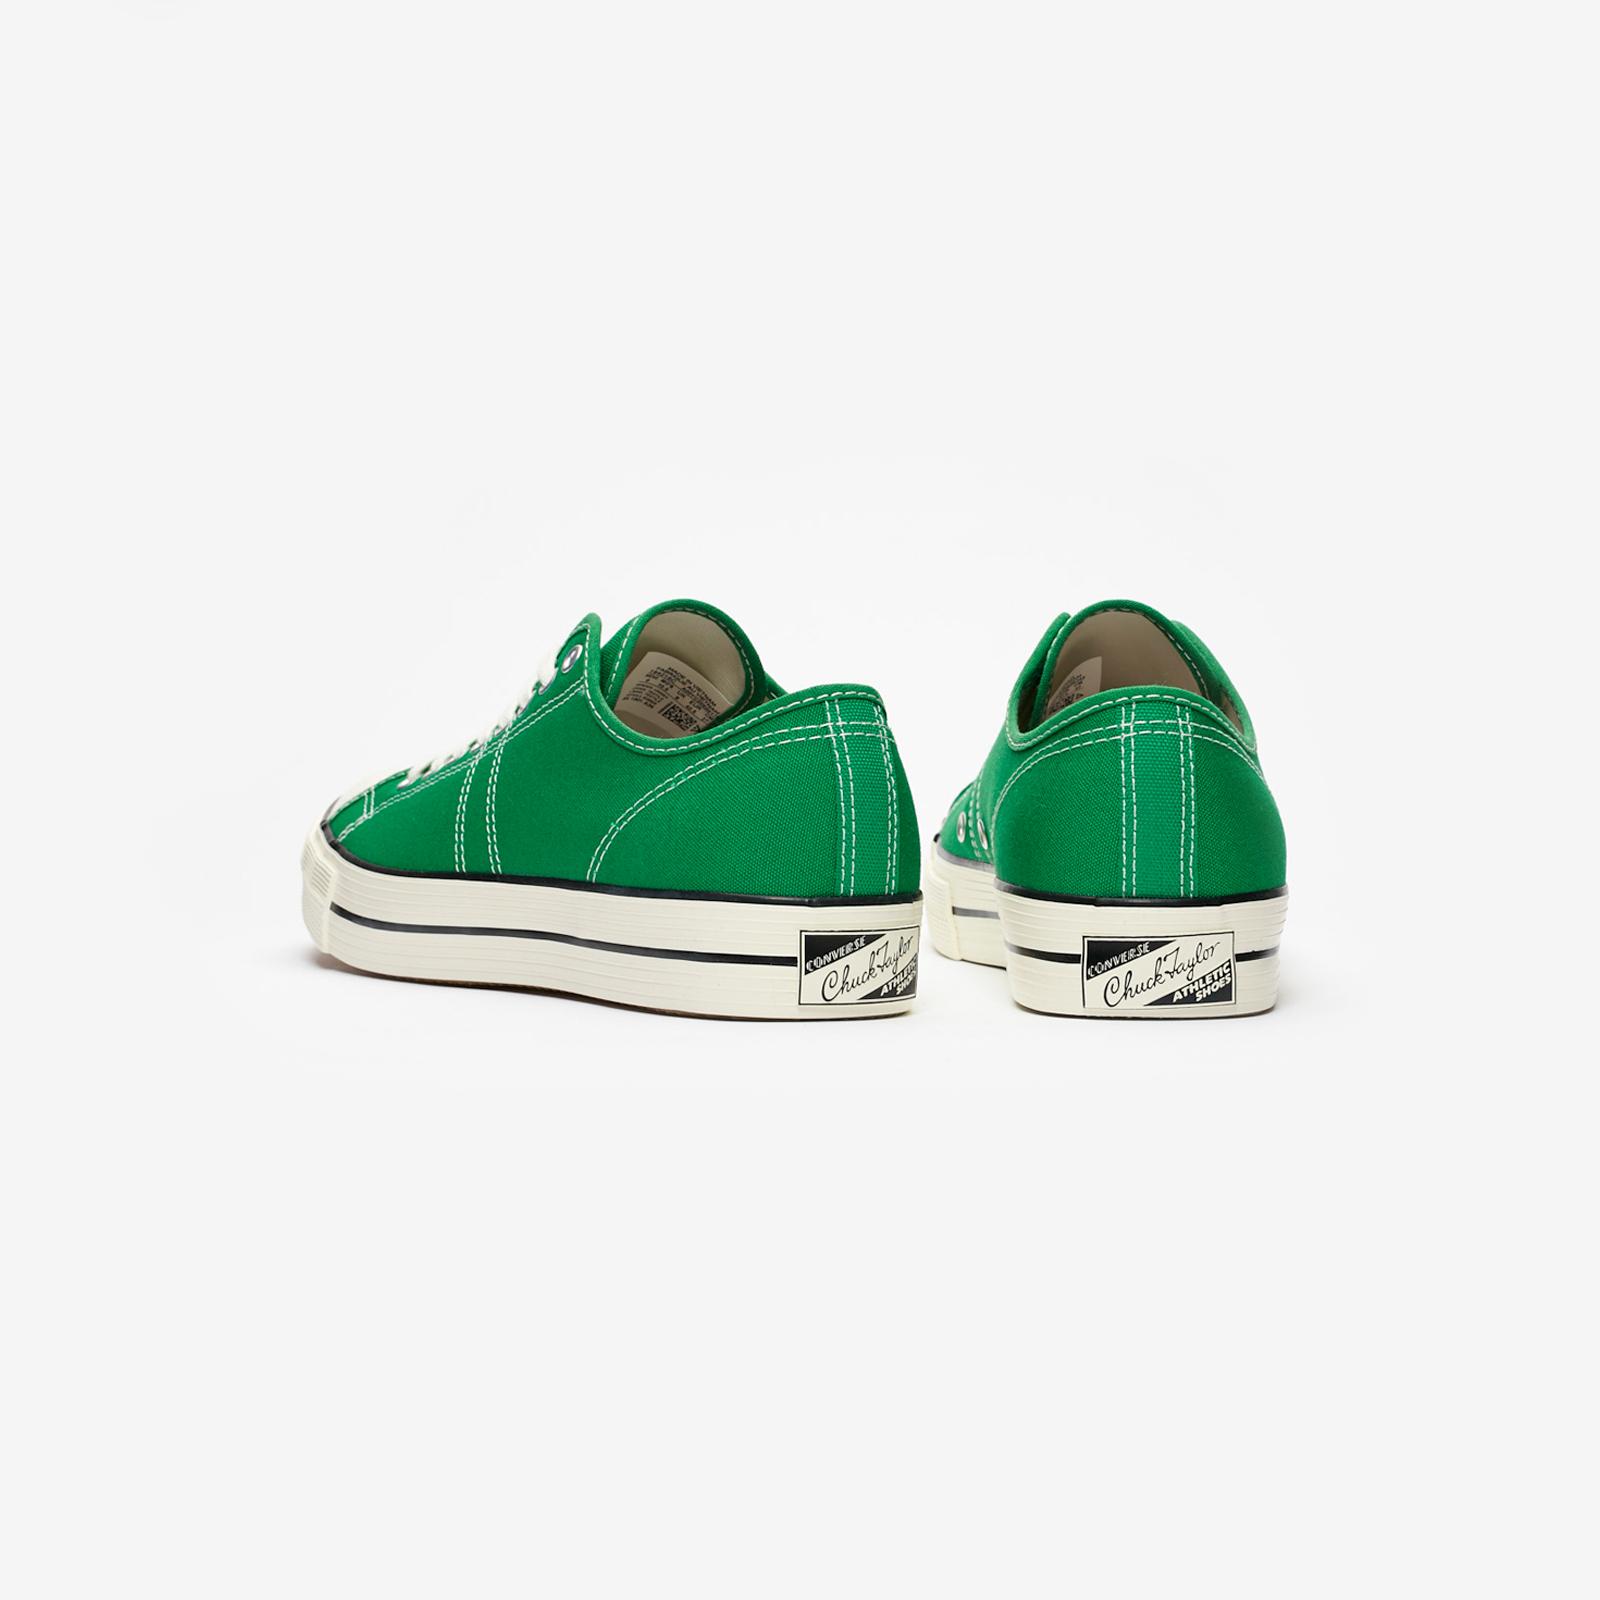 2f1f6fb8307 Converse Lucky Star Ox - 164216c - Sneakersnstuff I Sneakers & Streetwear  online seit 1999